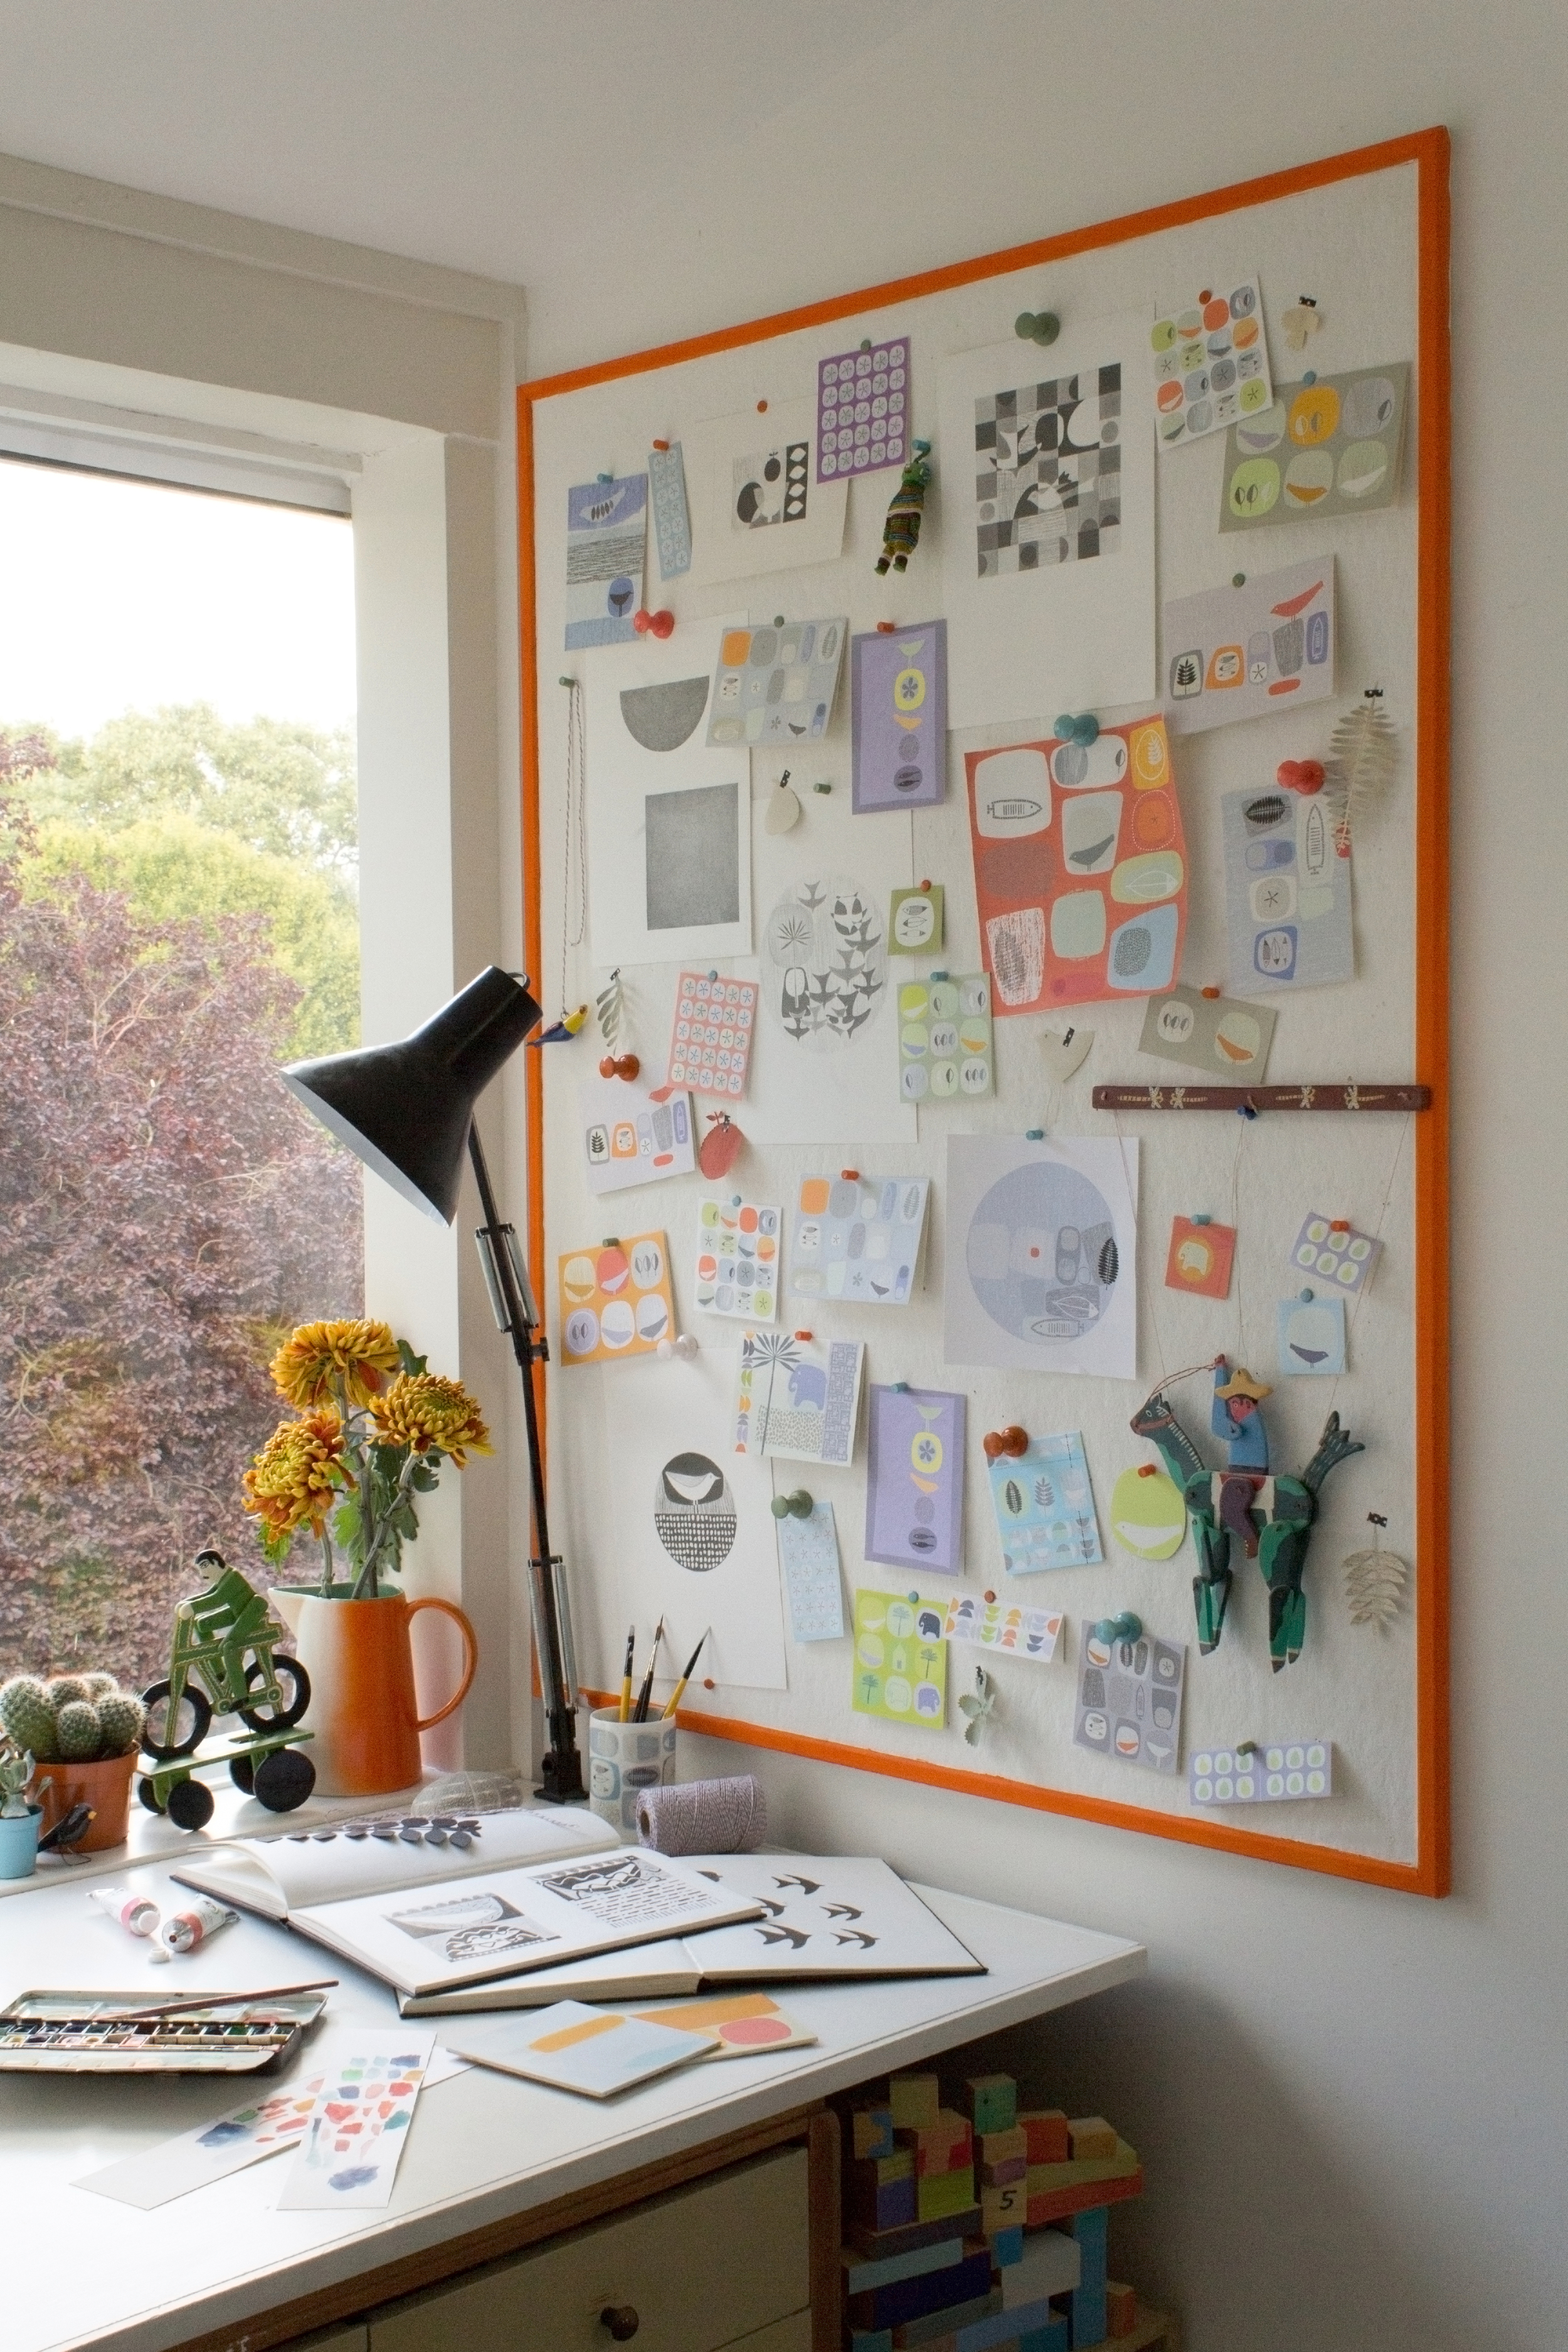 Sarah's Dulwich studio